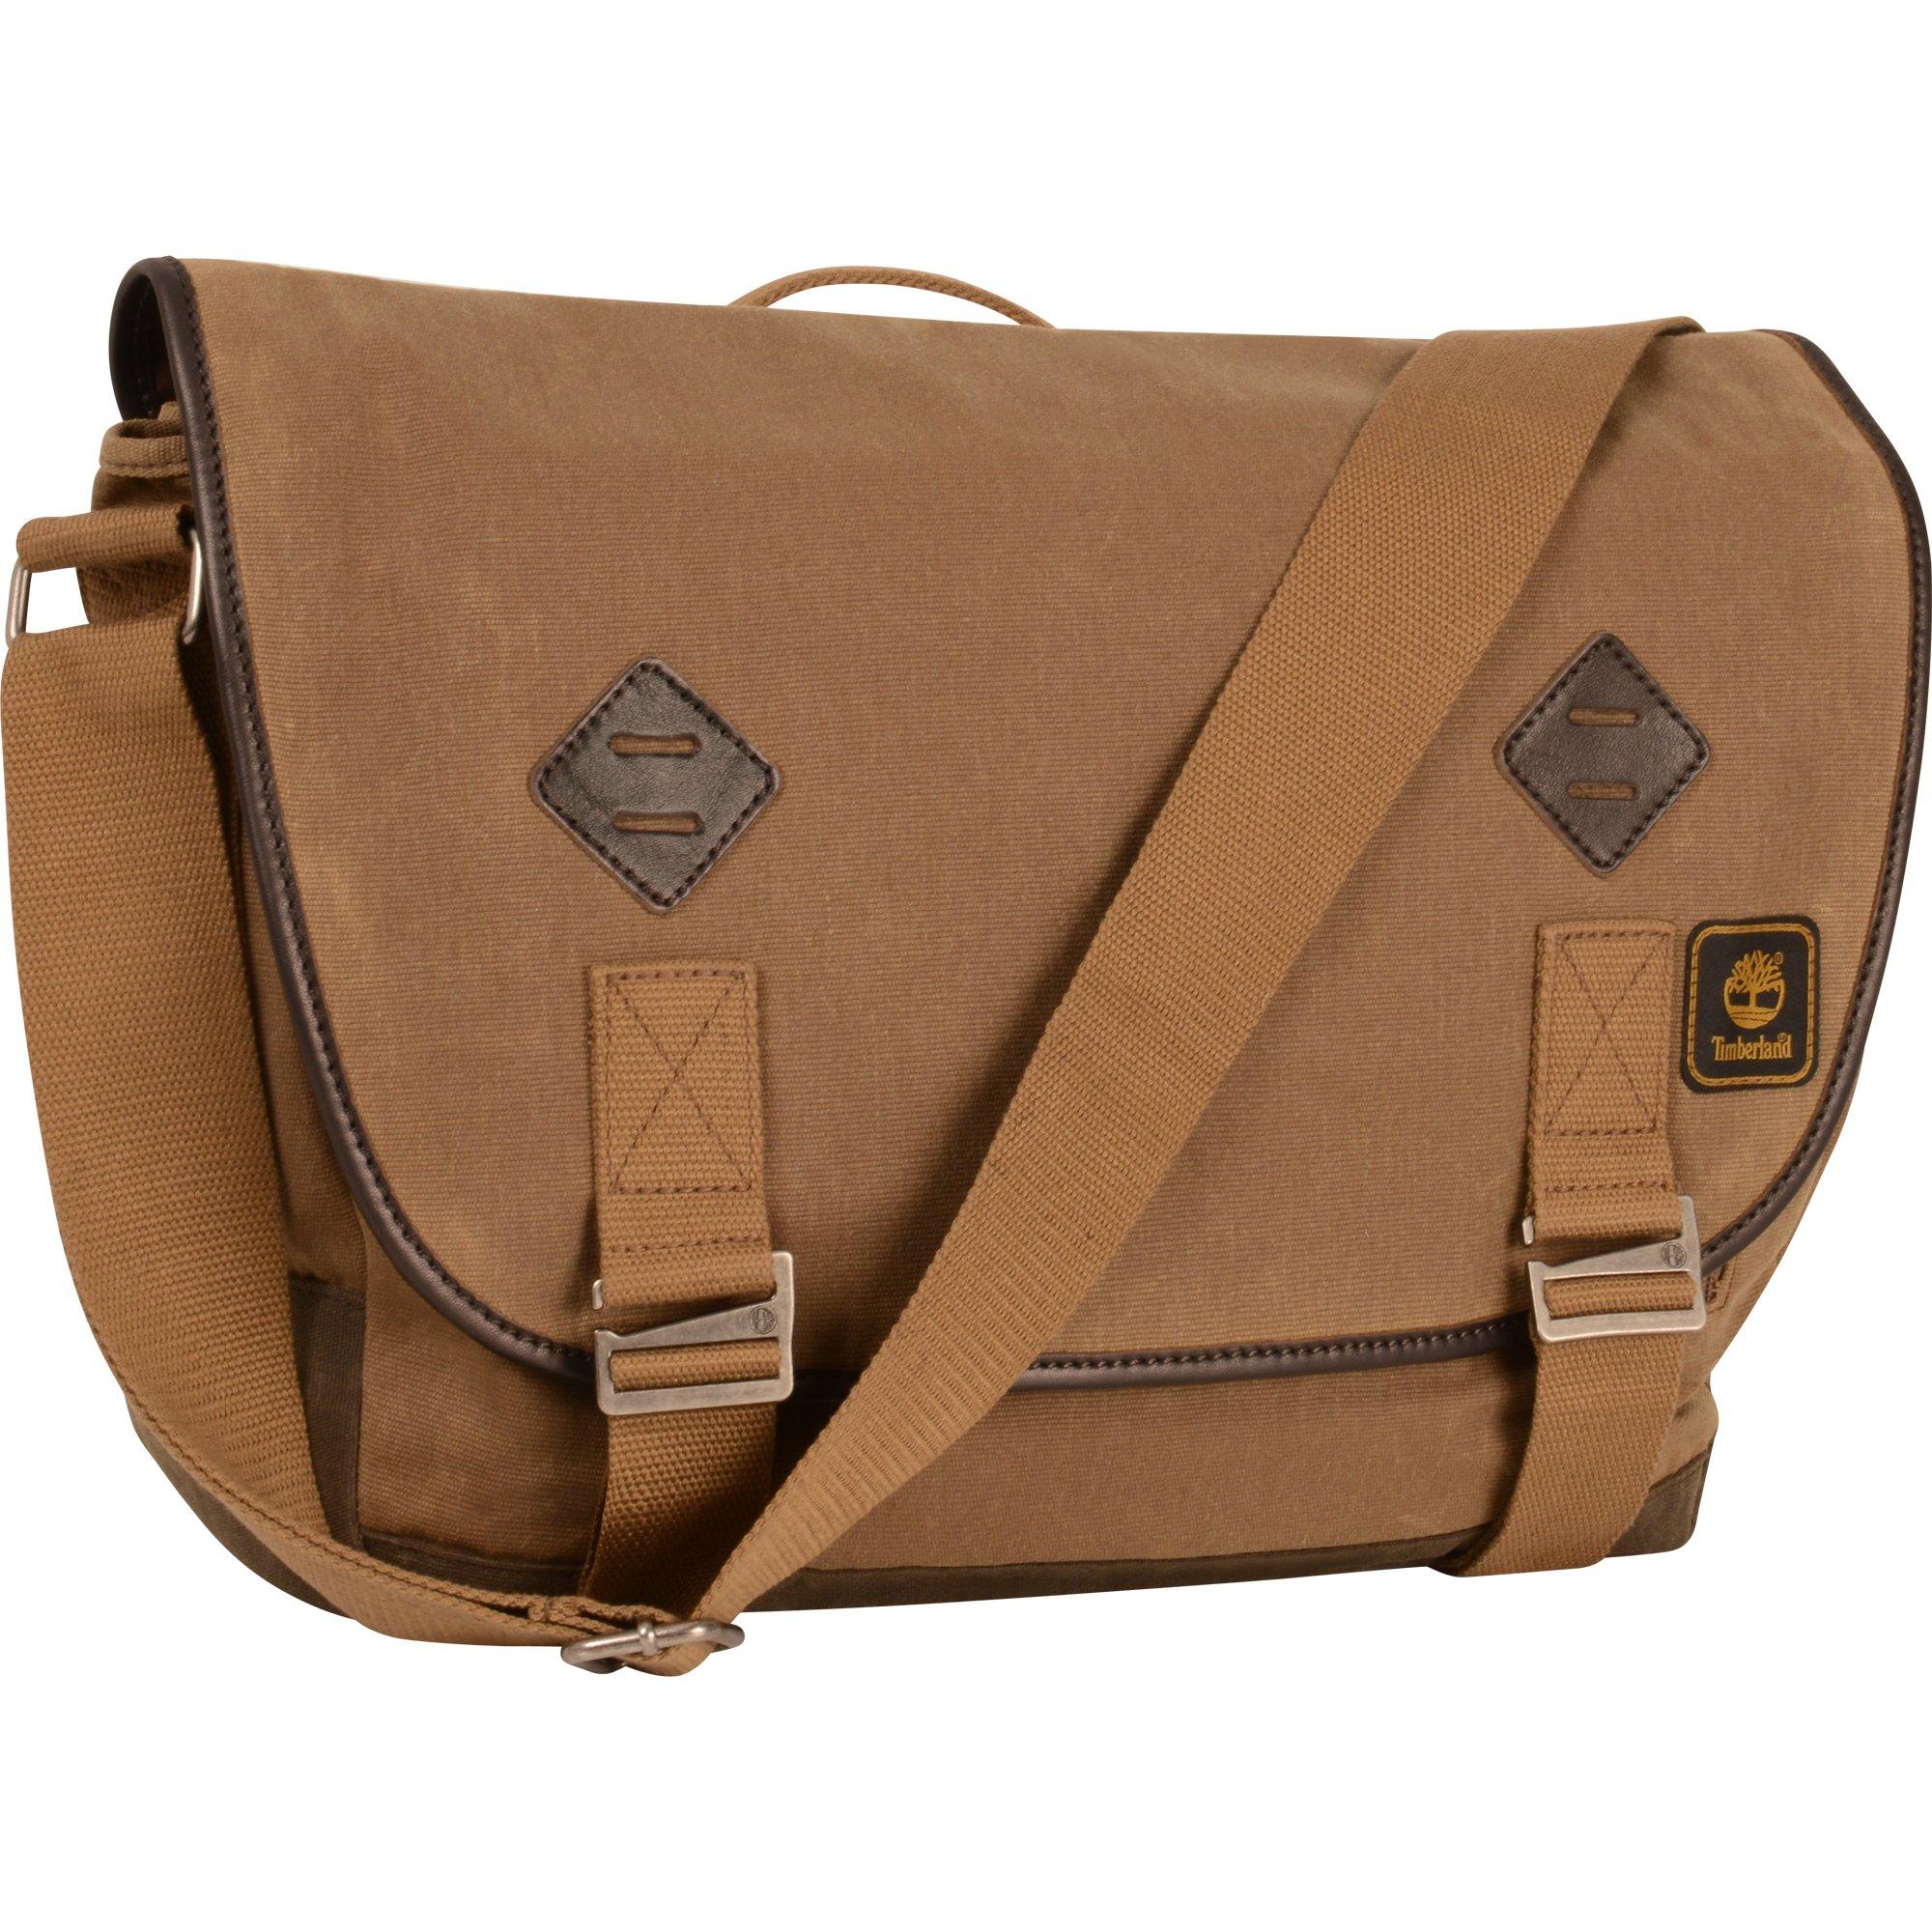 Timberland Messenger Backpack Briefcase Travel Bag, Tan